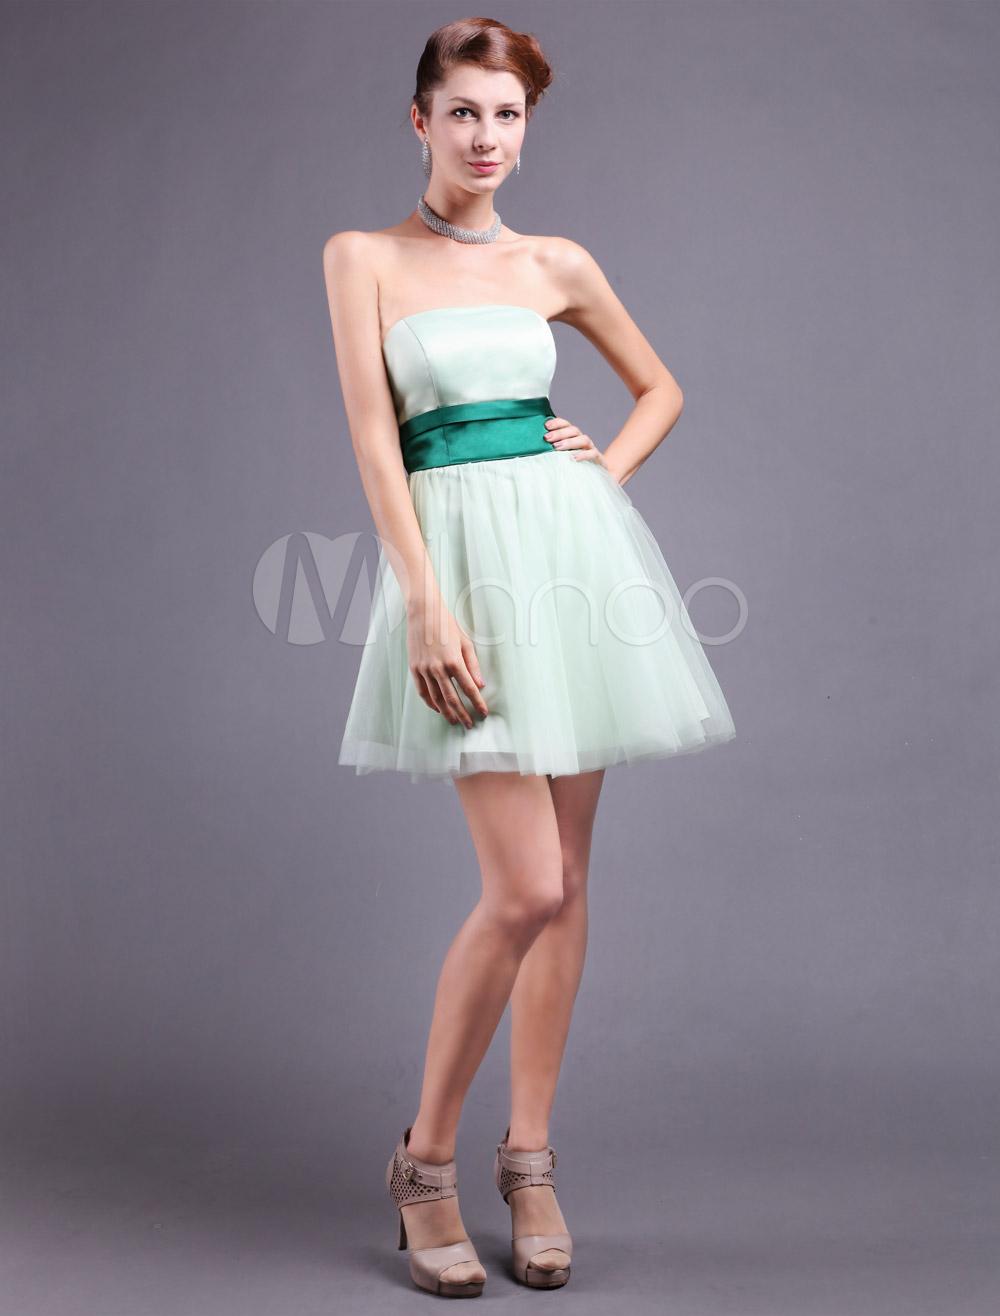 Chic Green Satin Sash Strapless Prom Dress (Wedding Cheap Party Dress) photo